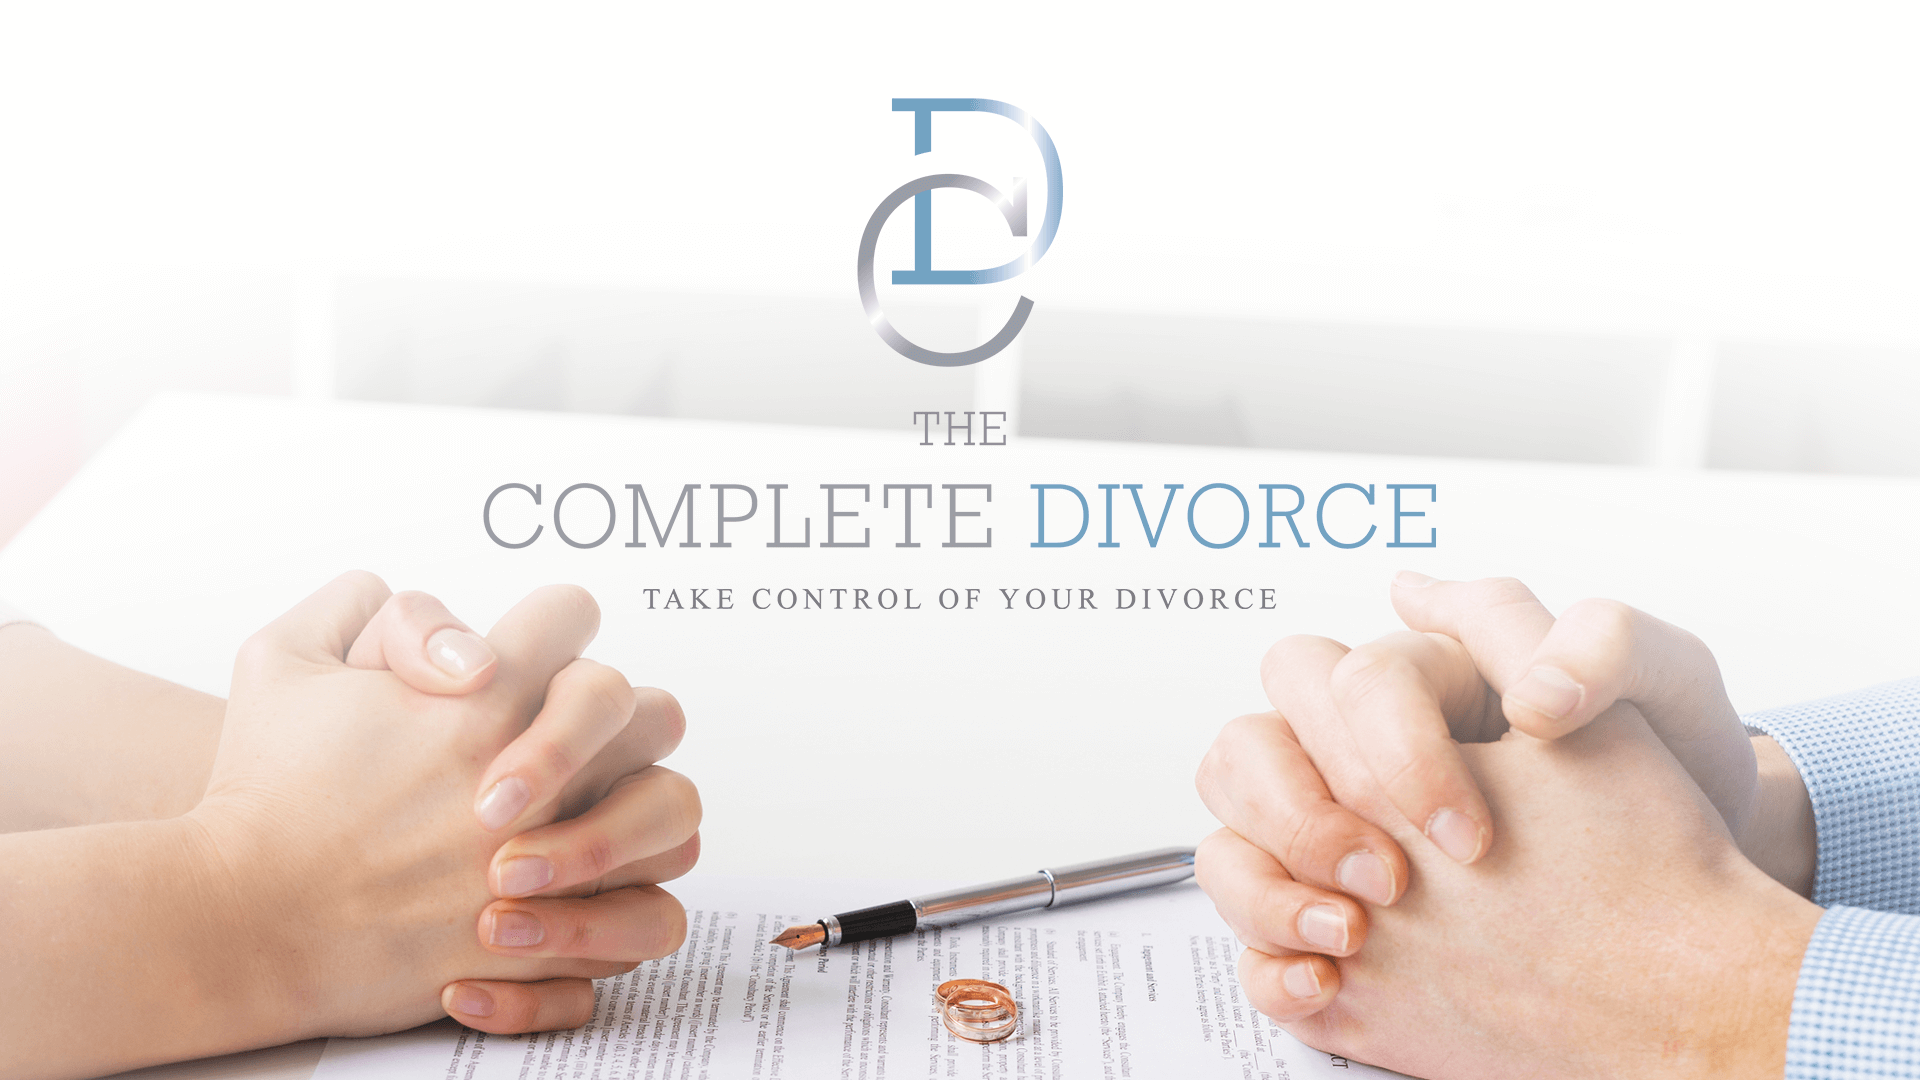 The Complete Divorce (Simple Plus)